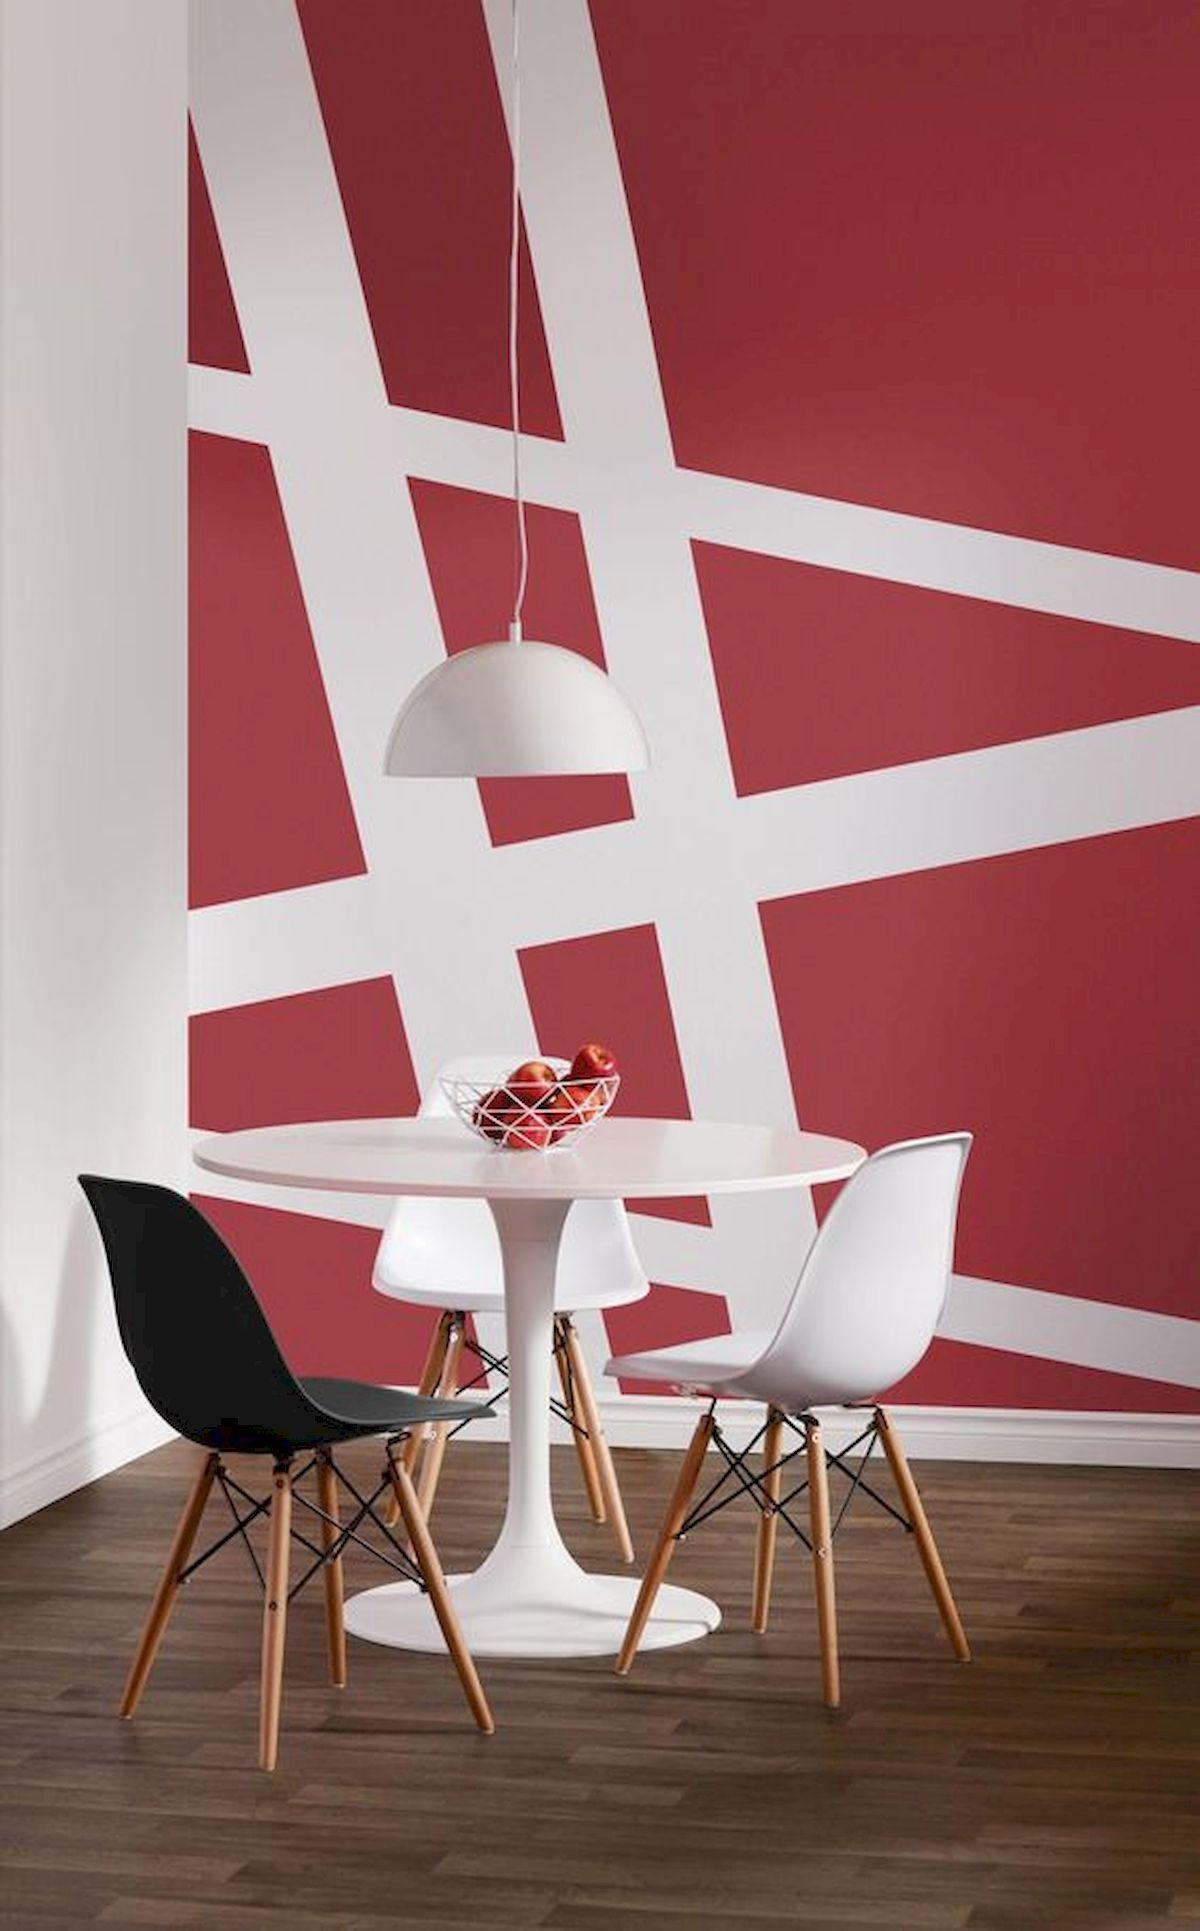 33 Best Geometric Wall Art Paint Design Ideas33DECOR Diy